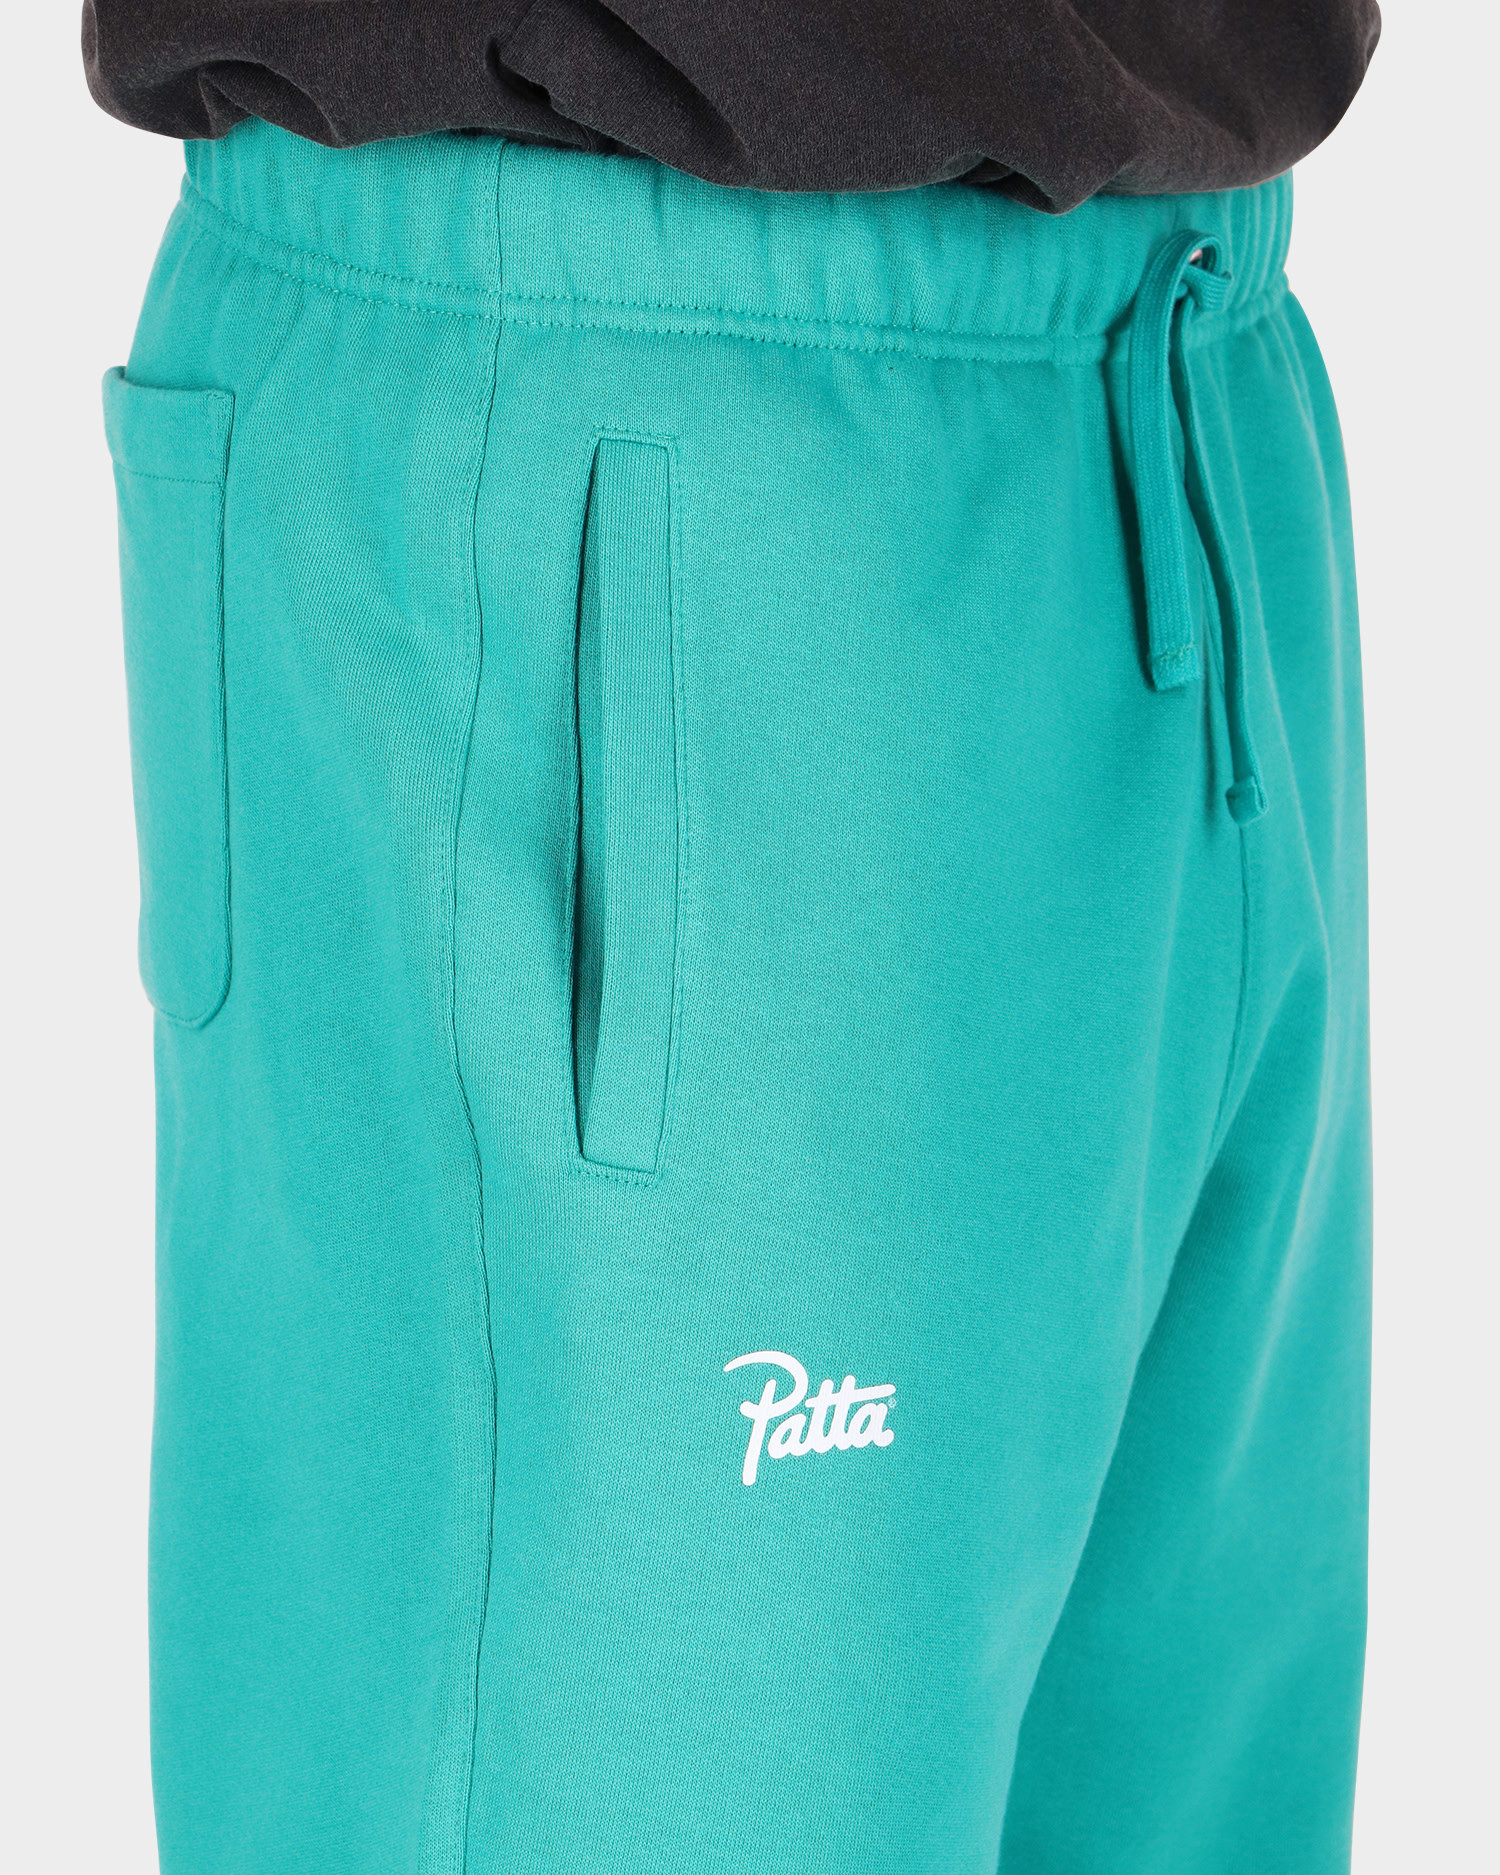 Patta Basic Summer Jogging Pants Columbia